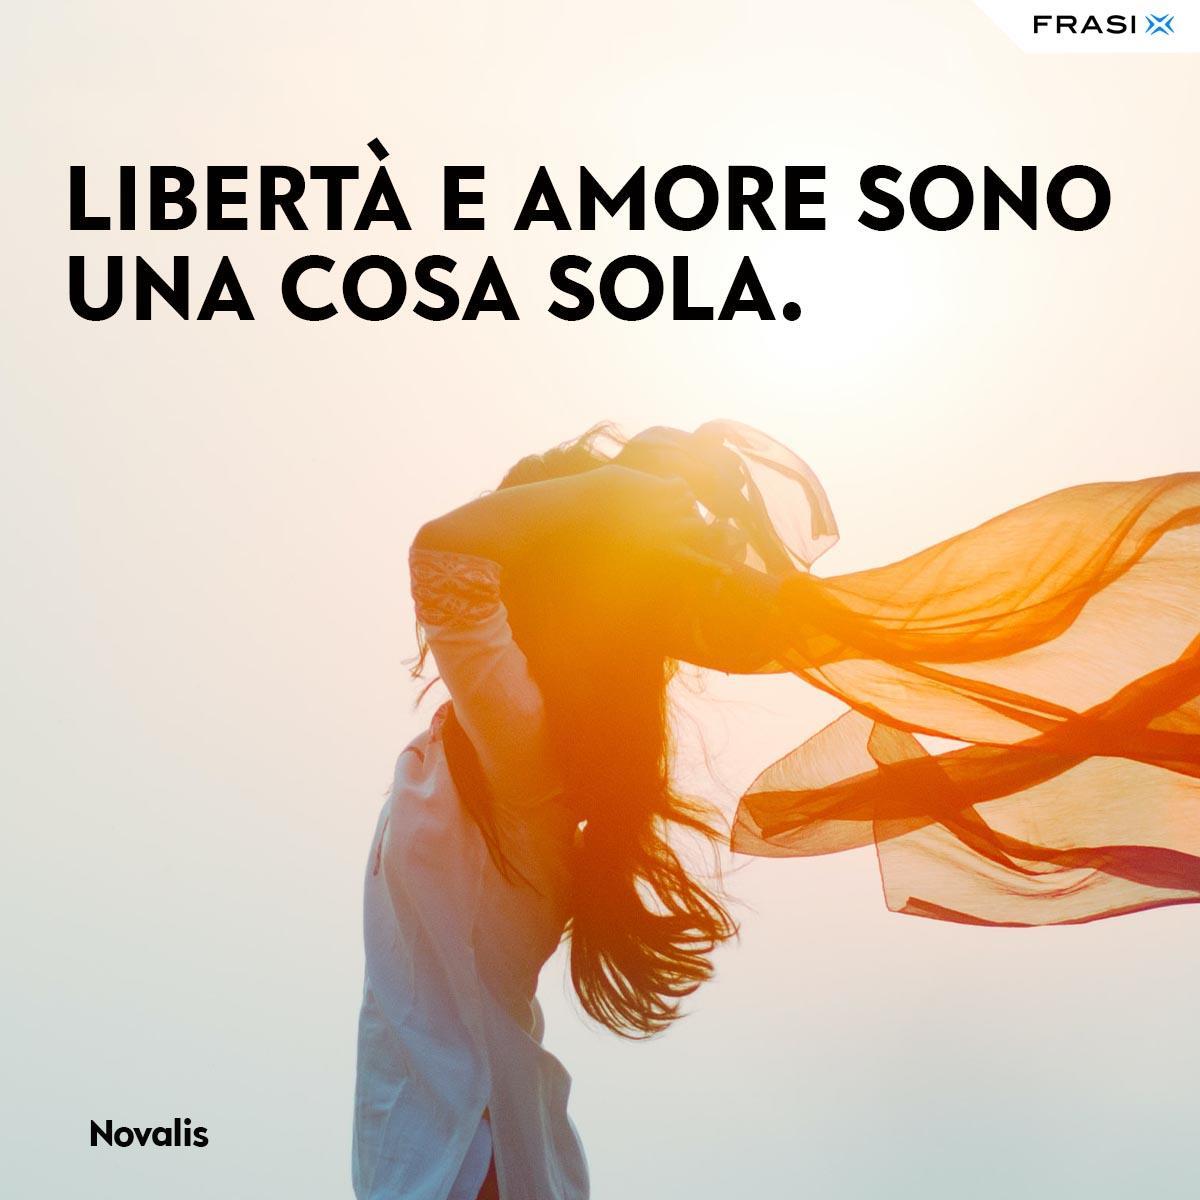 Frasi e aforismi d'amore Novalis